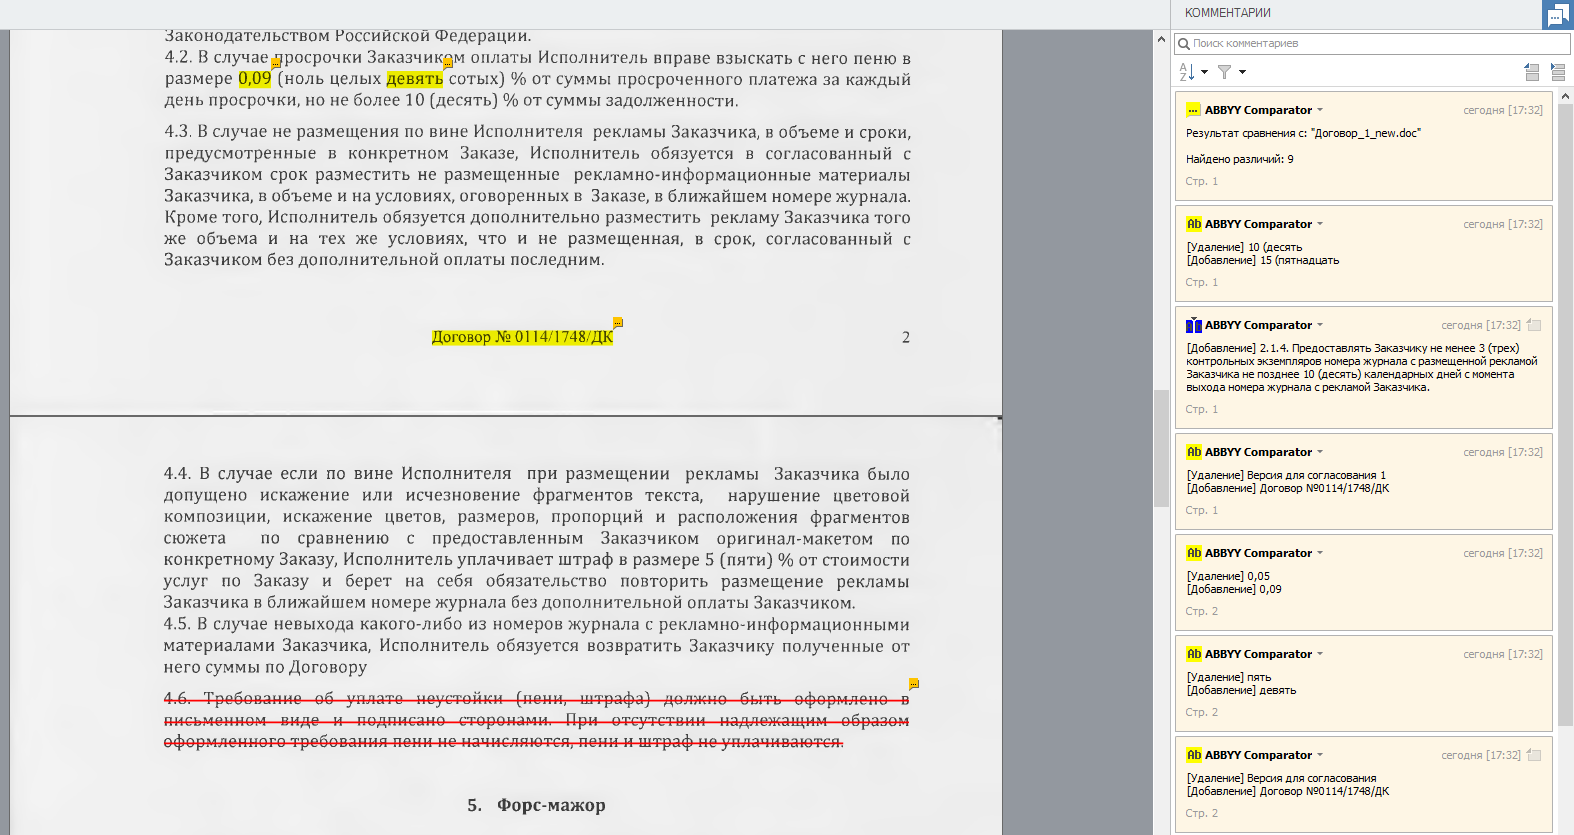 Отчет о различиях в виде PDF-документа с комментариями